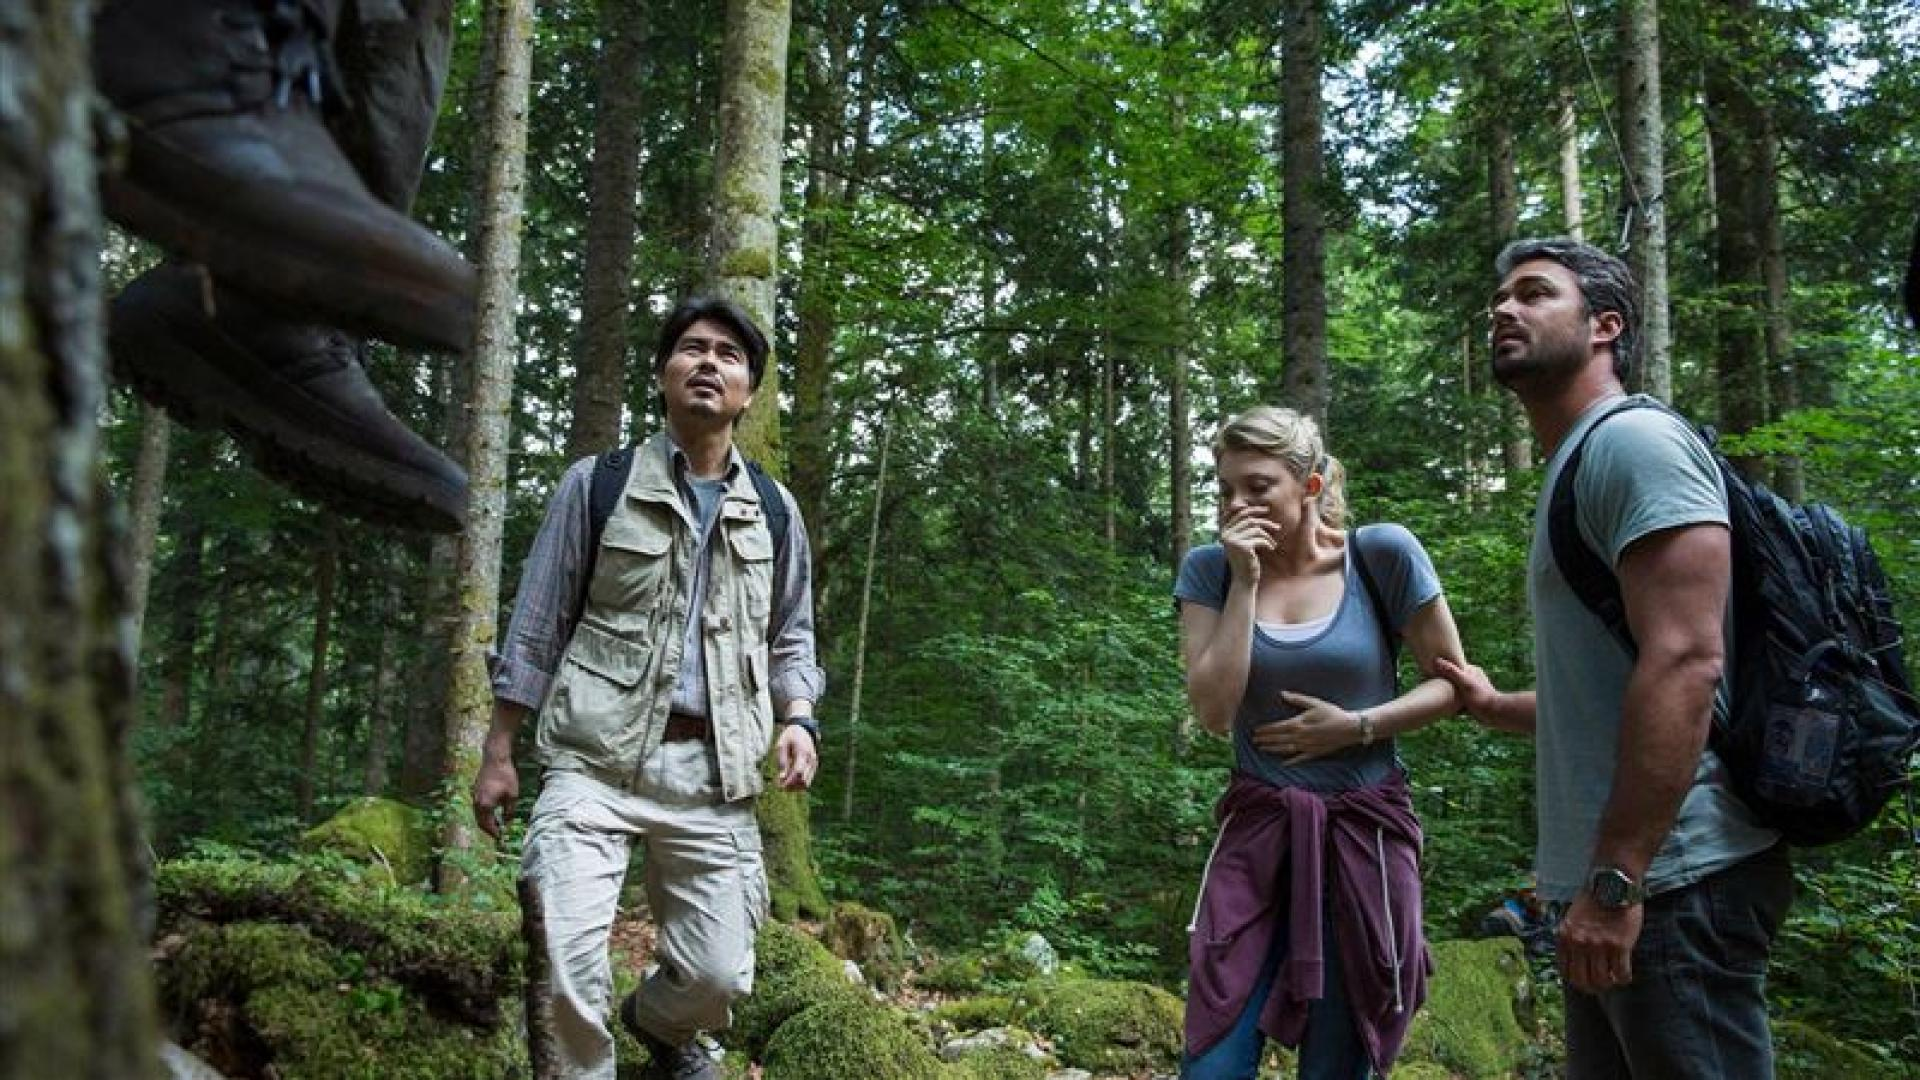 The Forest (2016) 2. kép